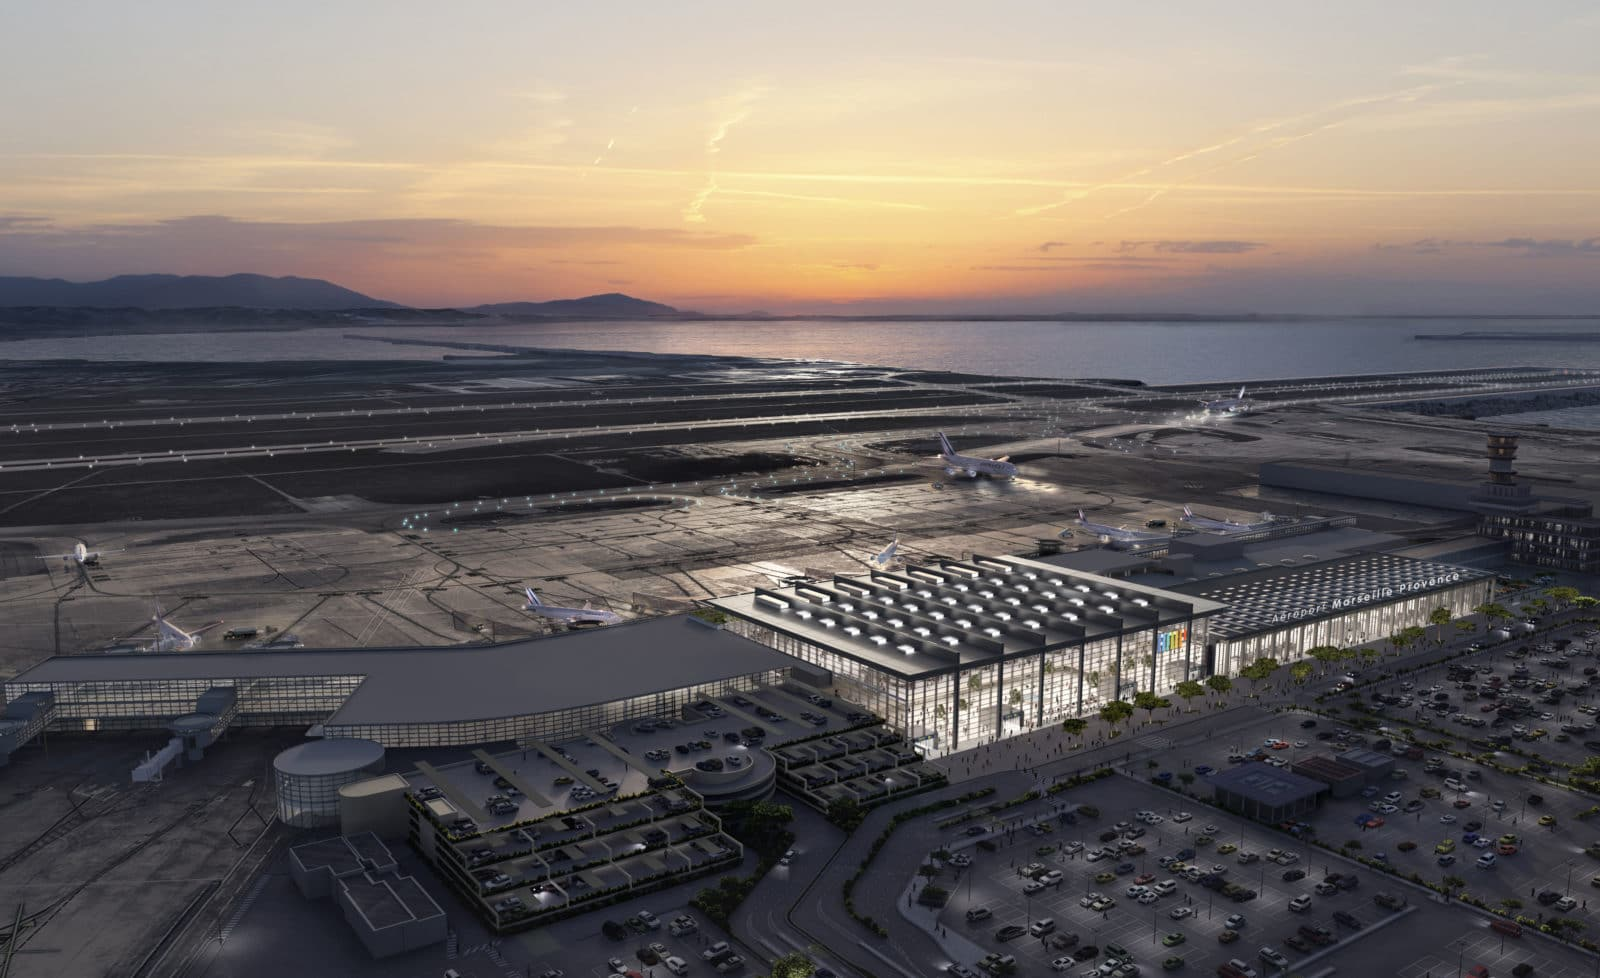 aeroport marseille extension foster 5